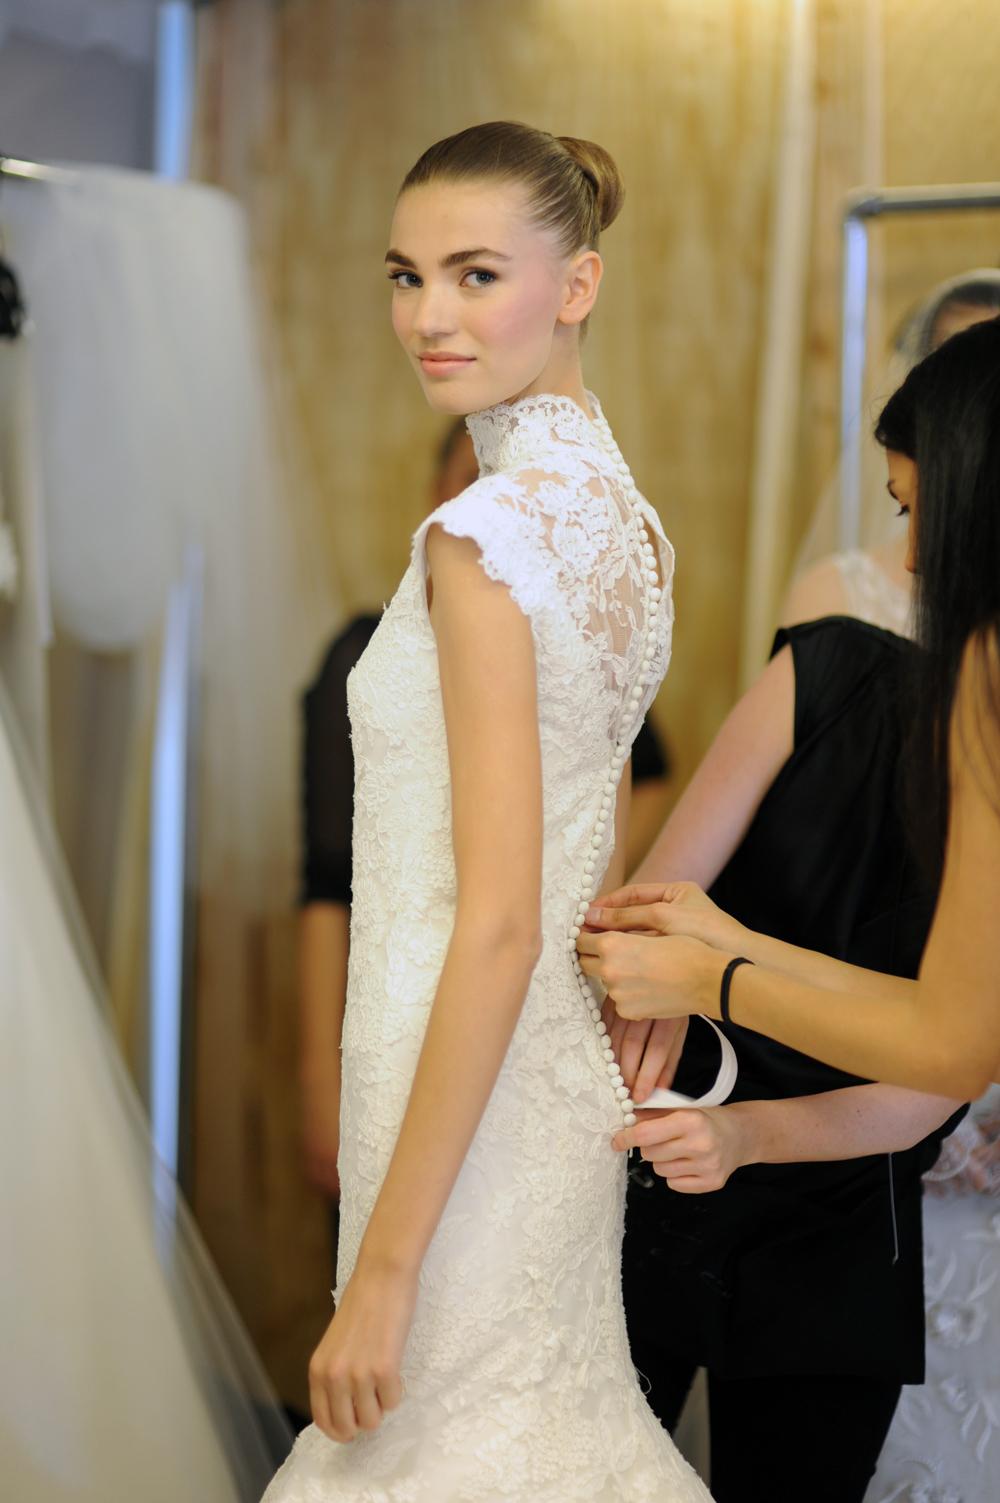 Oscar-de-la-renta-spring-2013-wedding-dress-lace-cap-sleeves.full